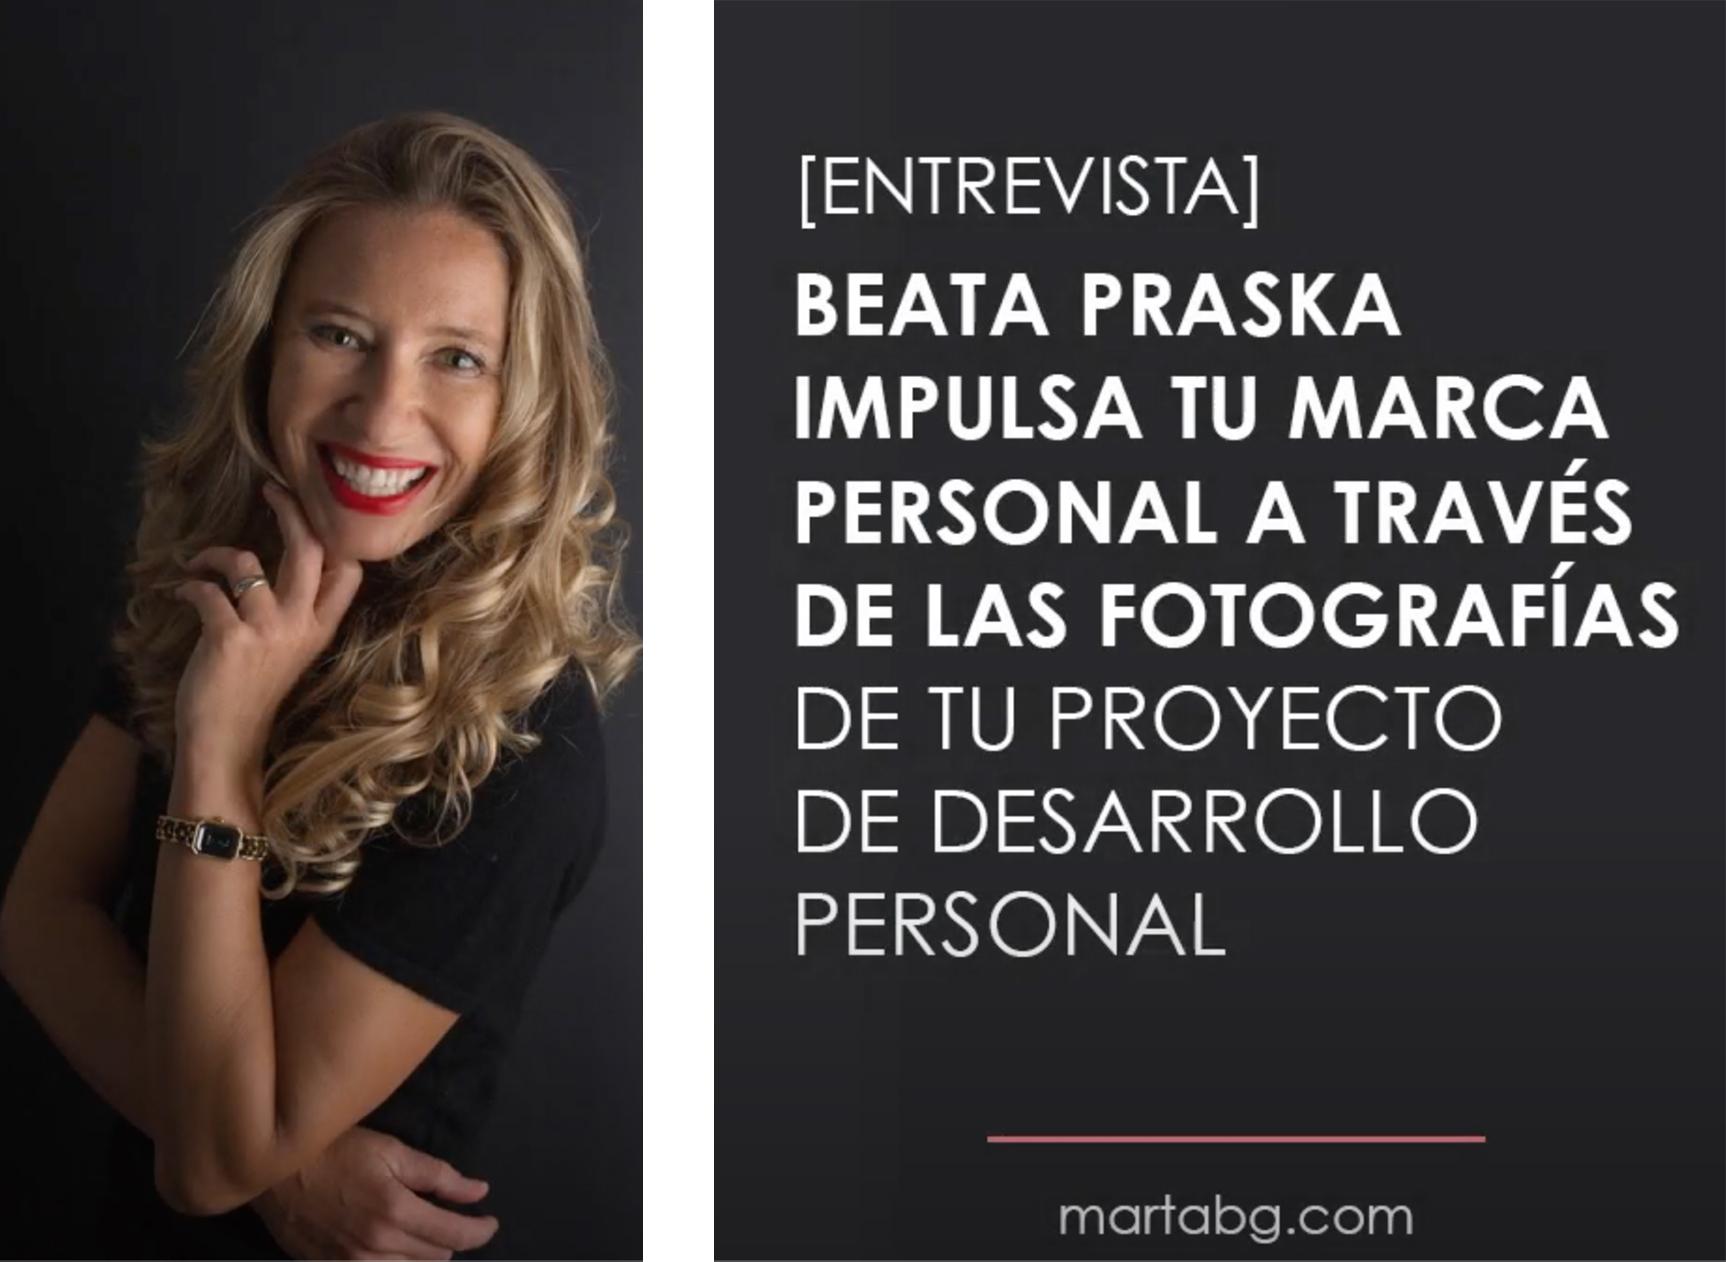 entrevista con Beata Praska sobre la importancia de fotografia de marca personal